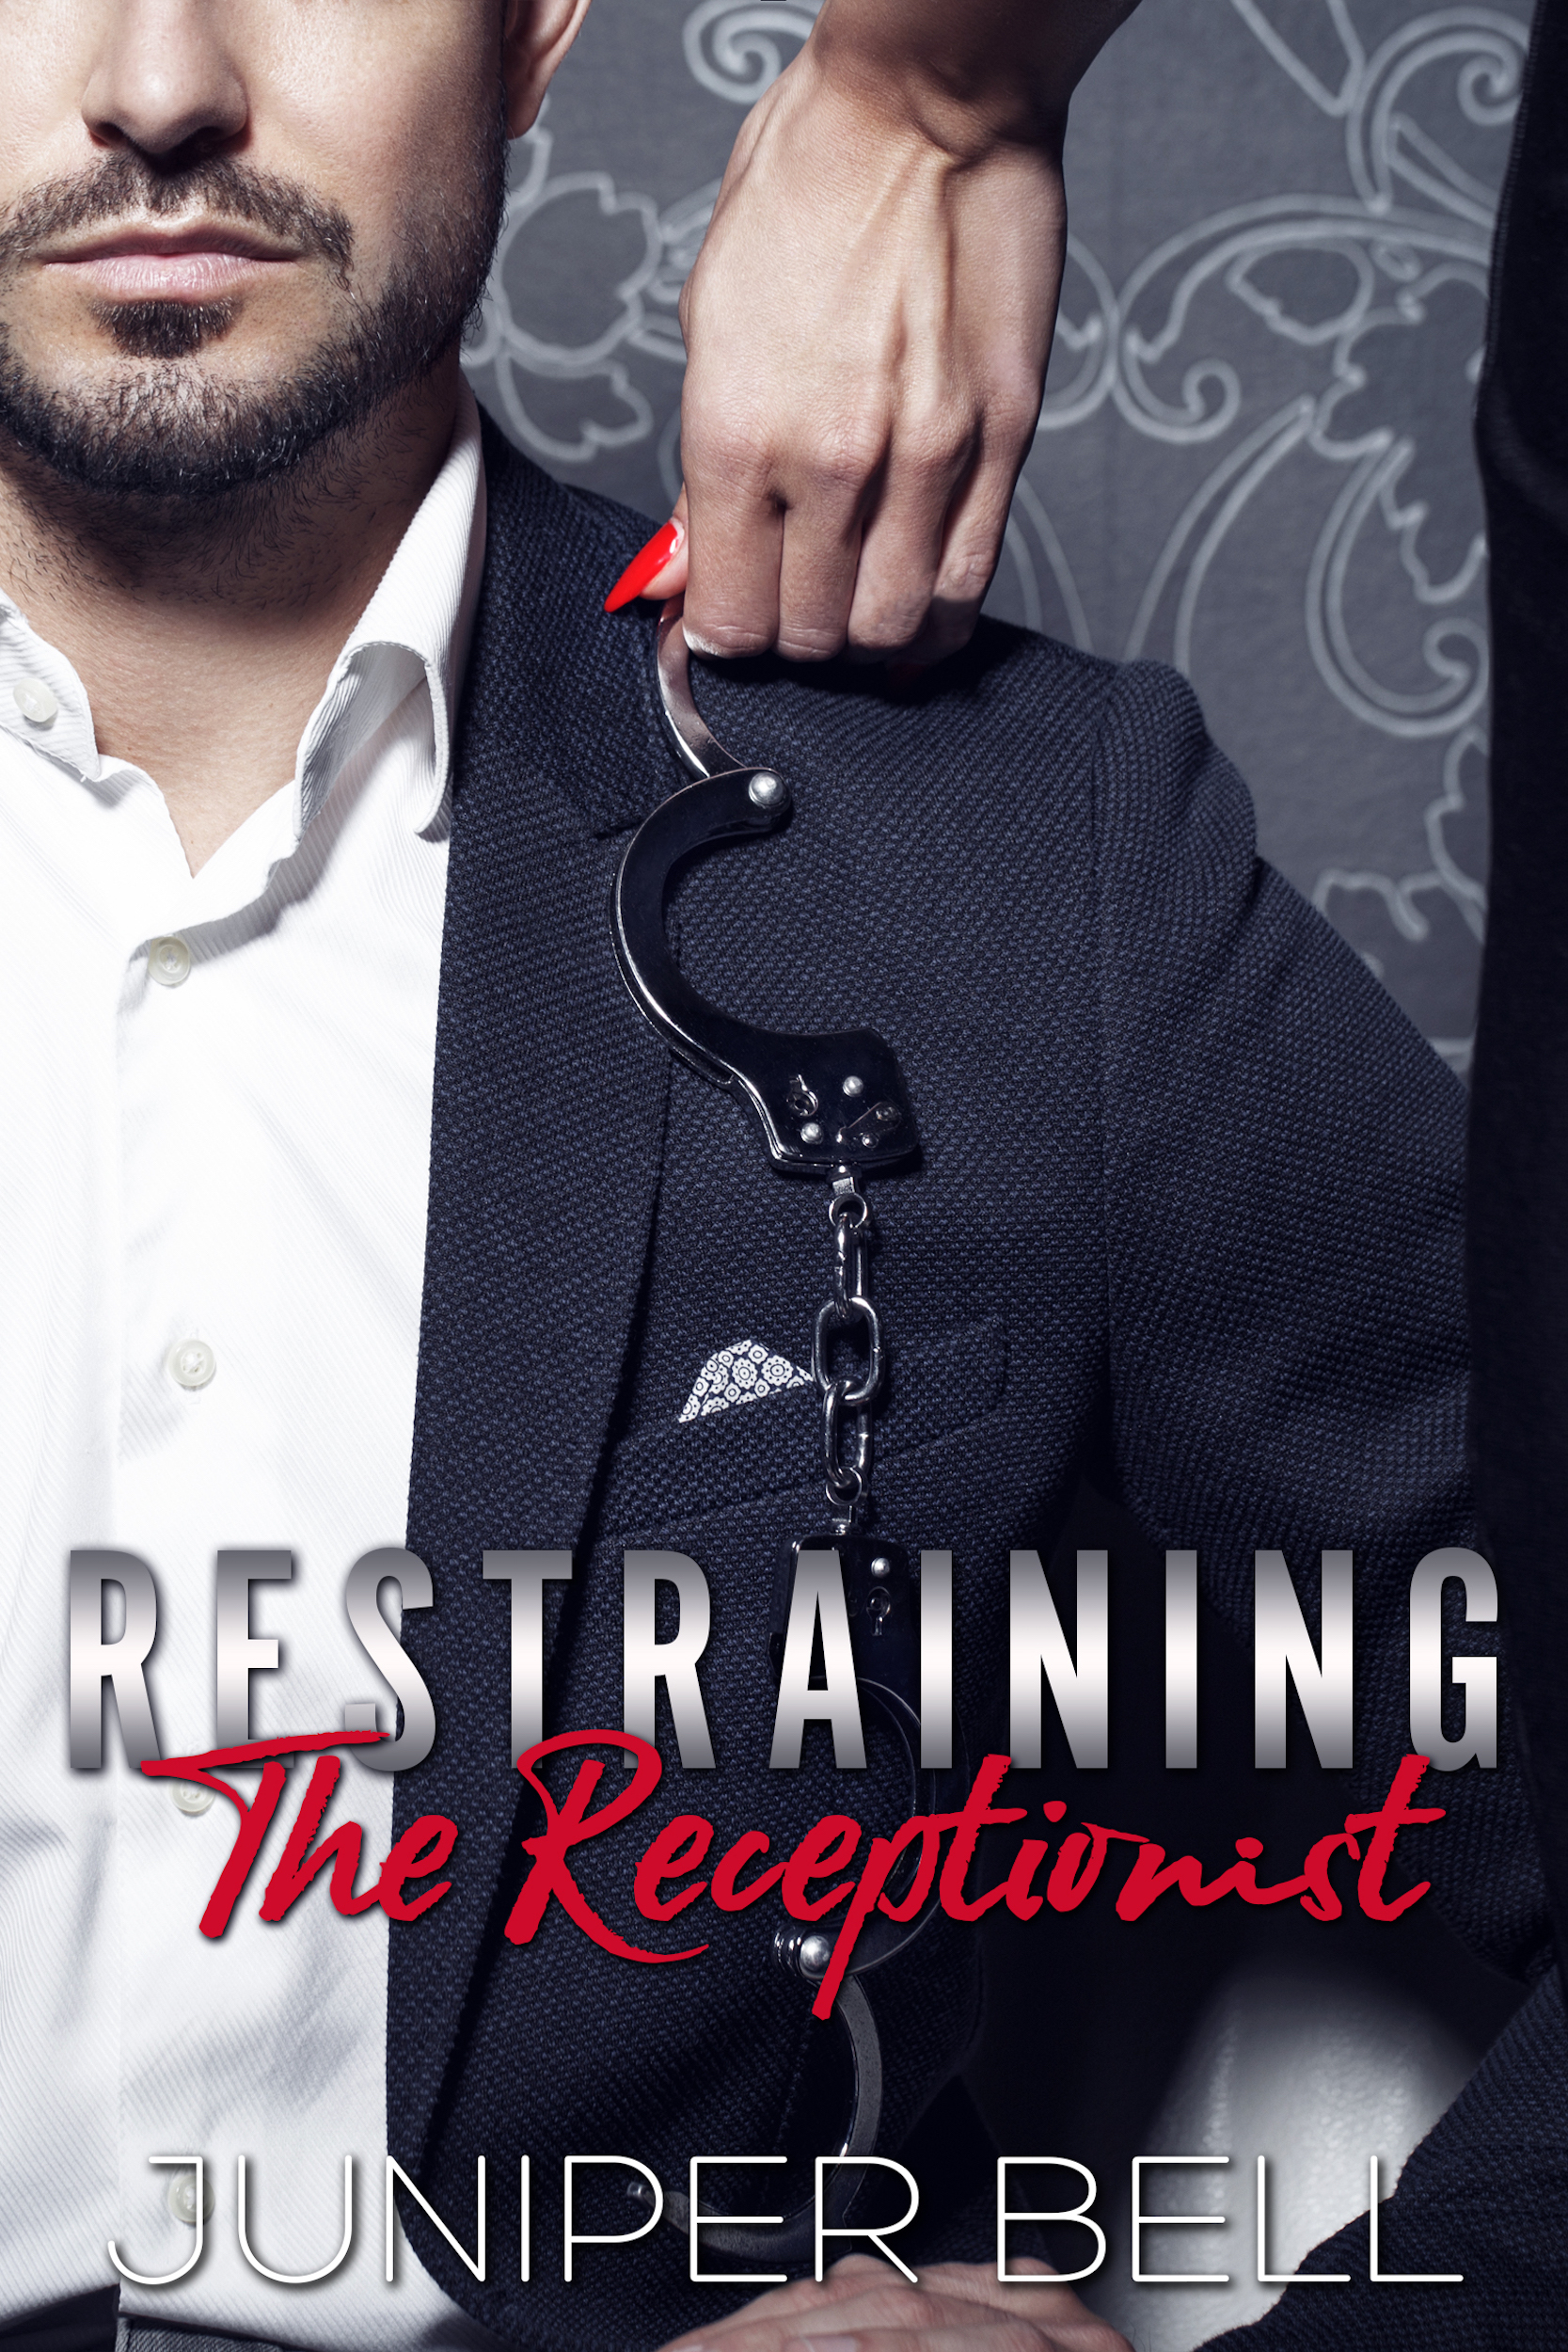 Restraining-the-Receptionist.jpg